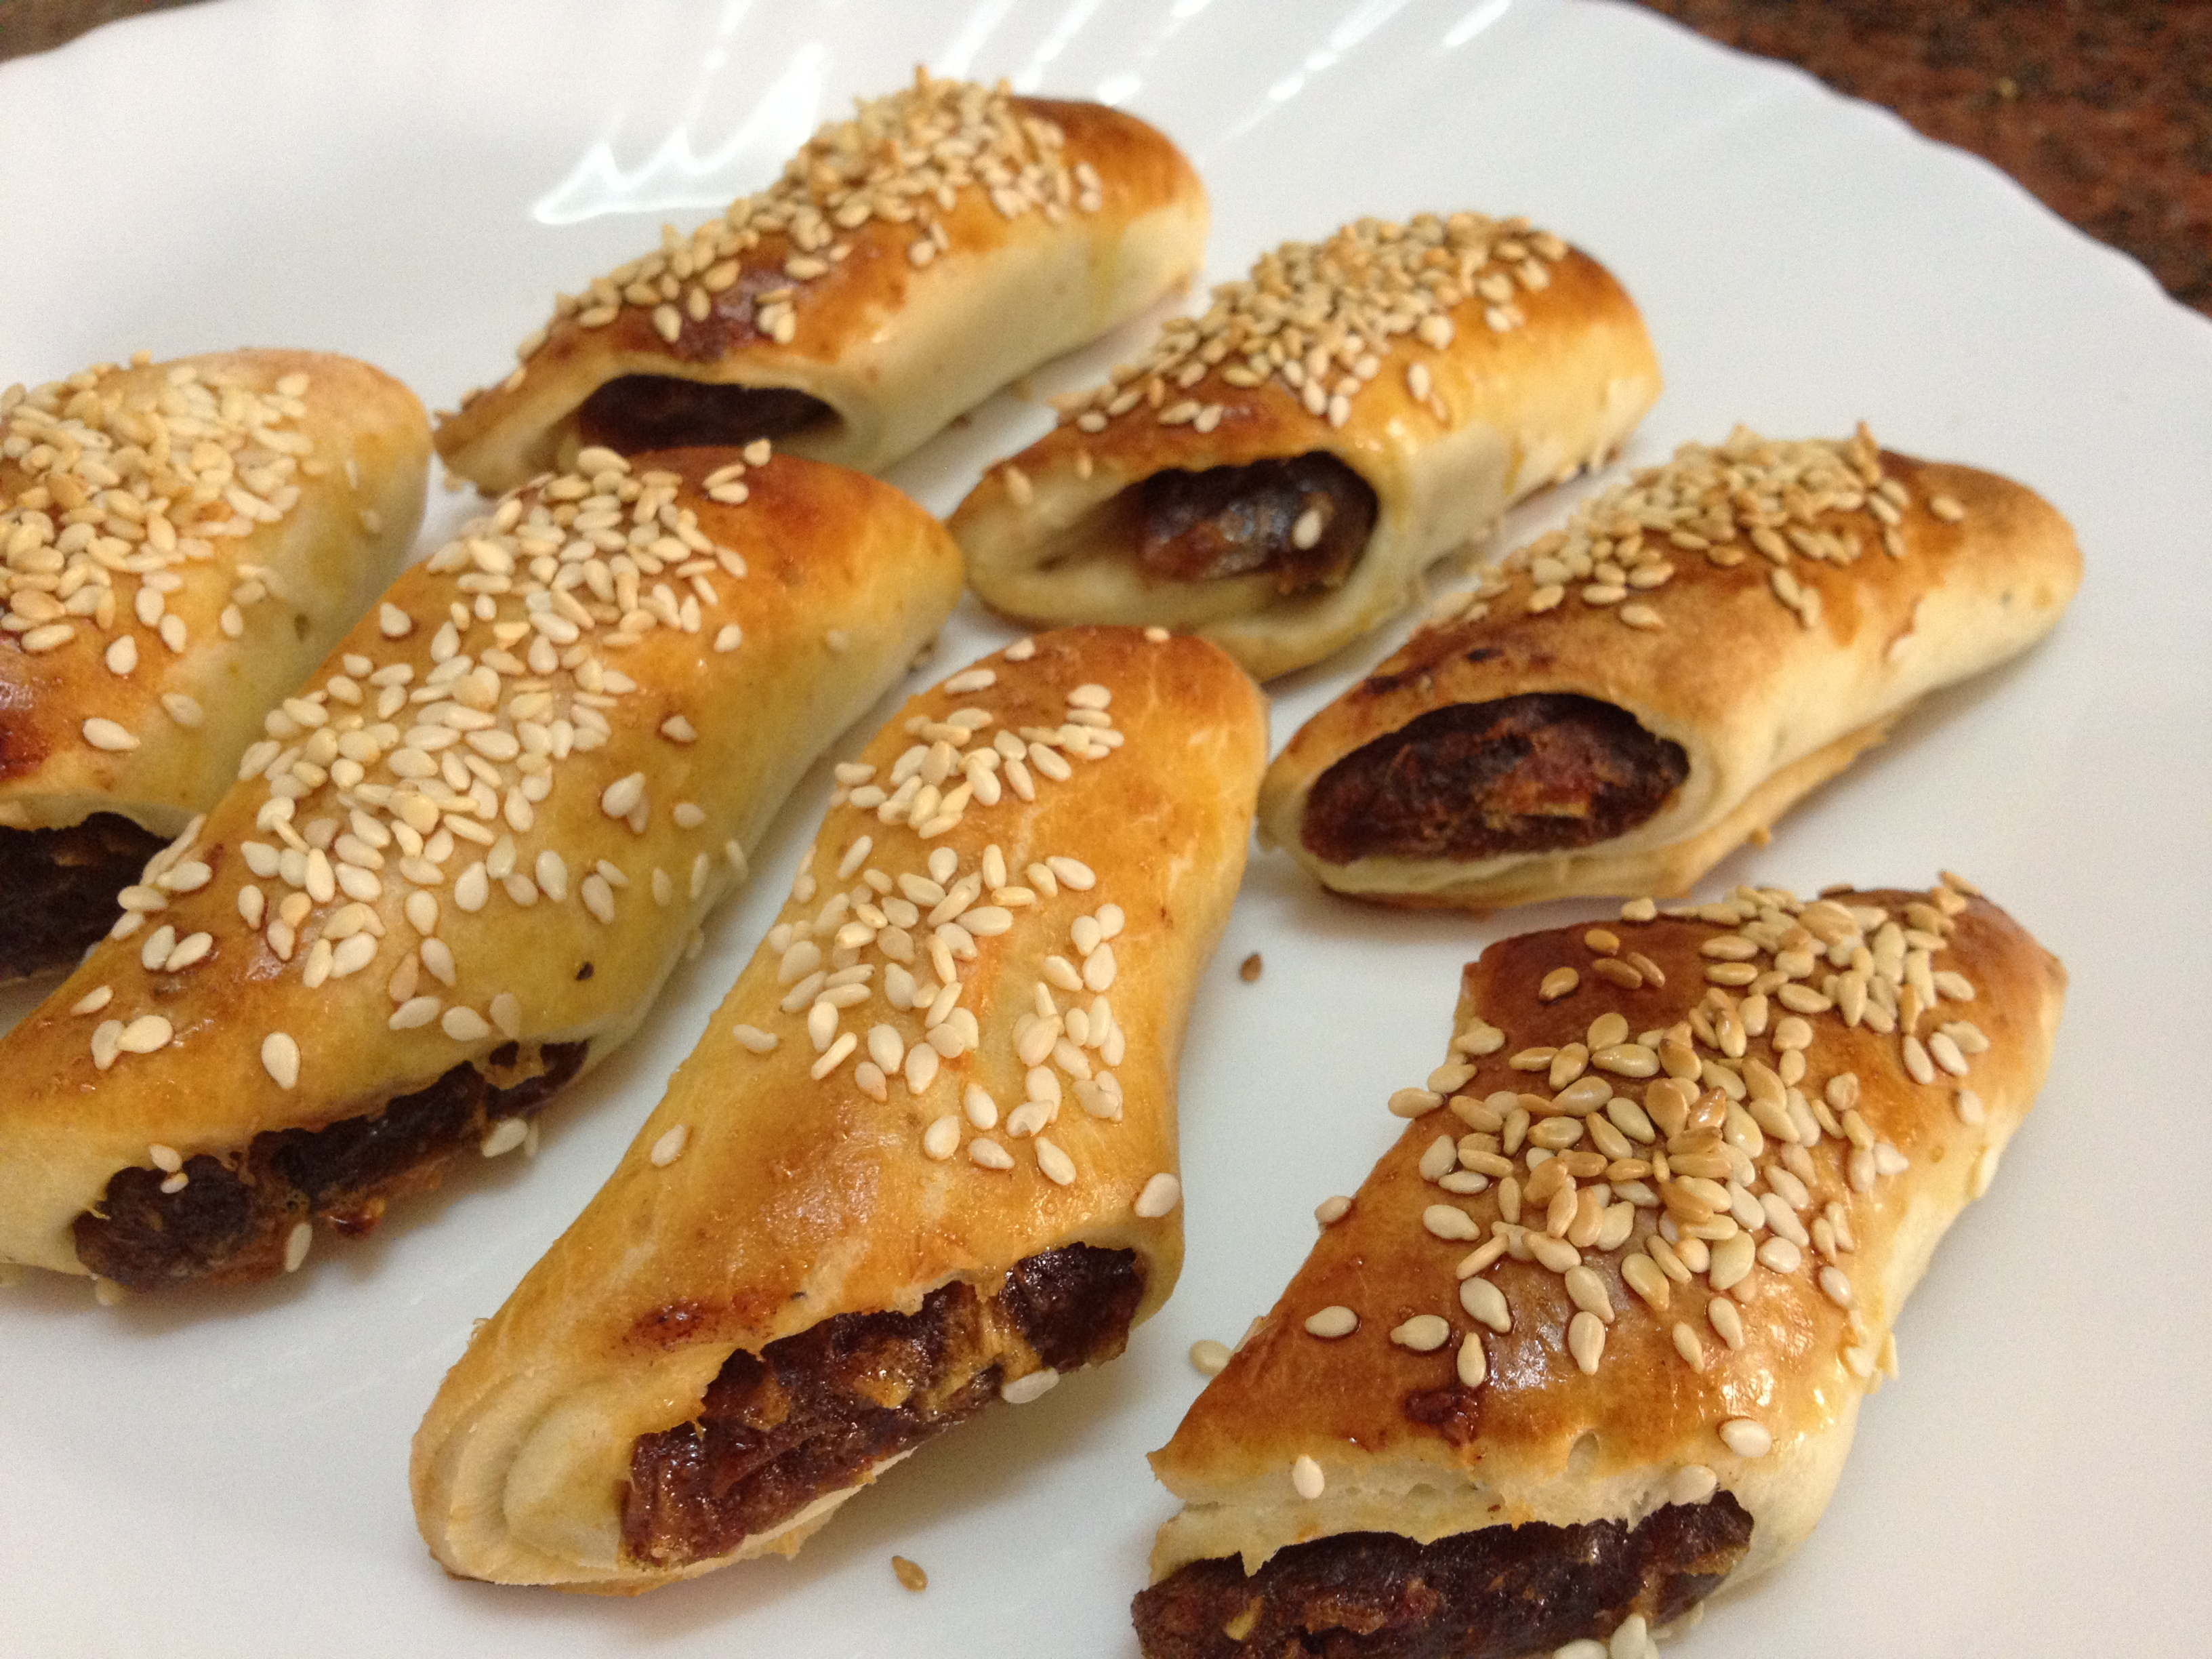 صور حلويات مغربية بالصور